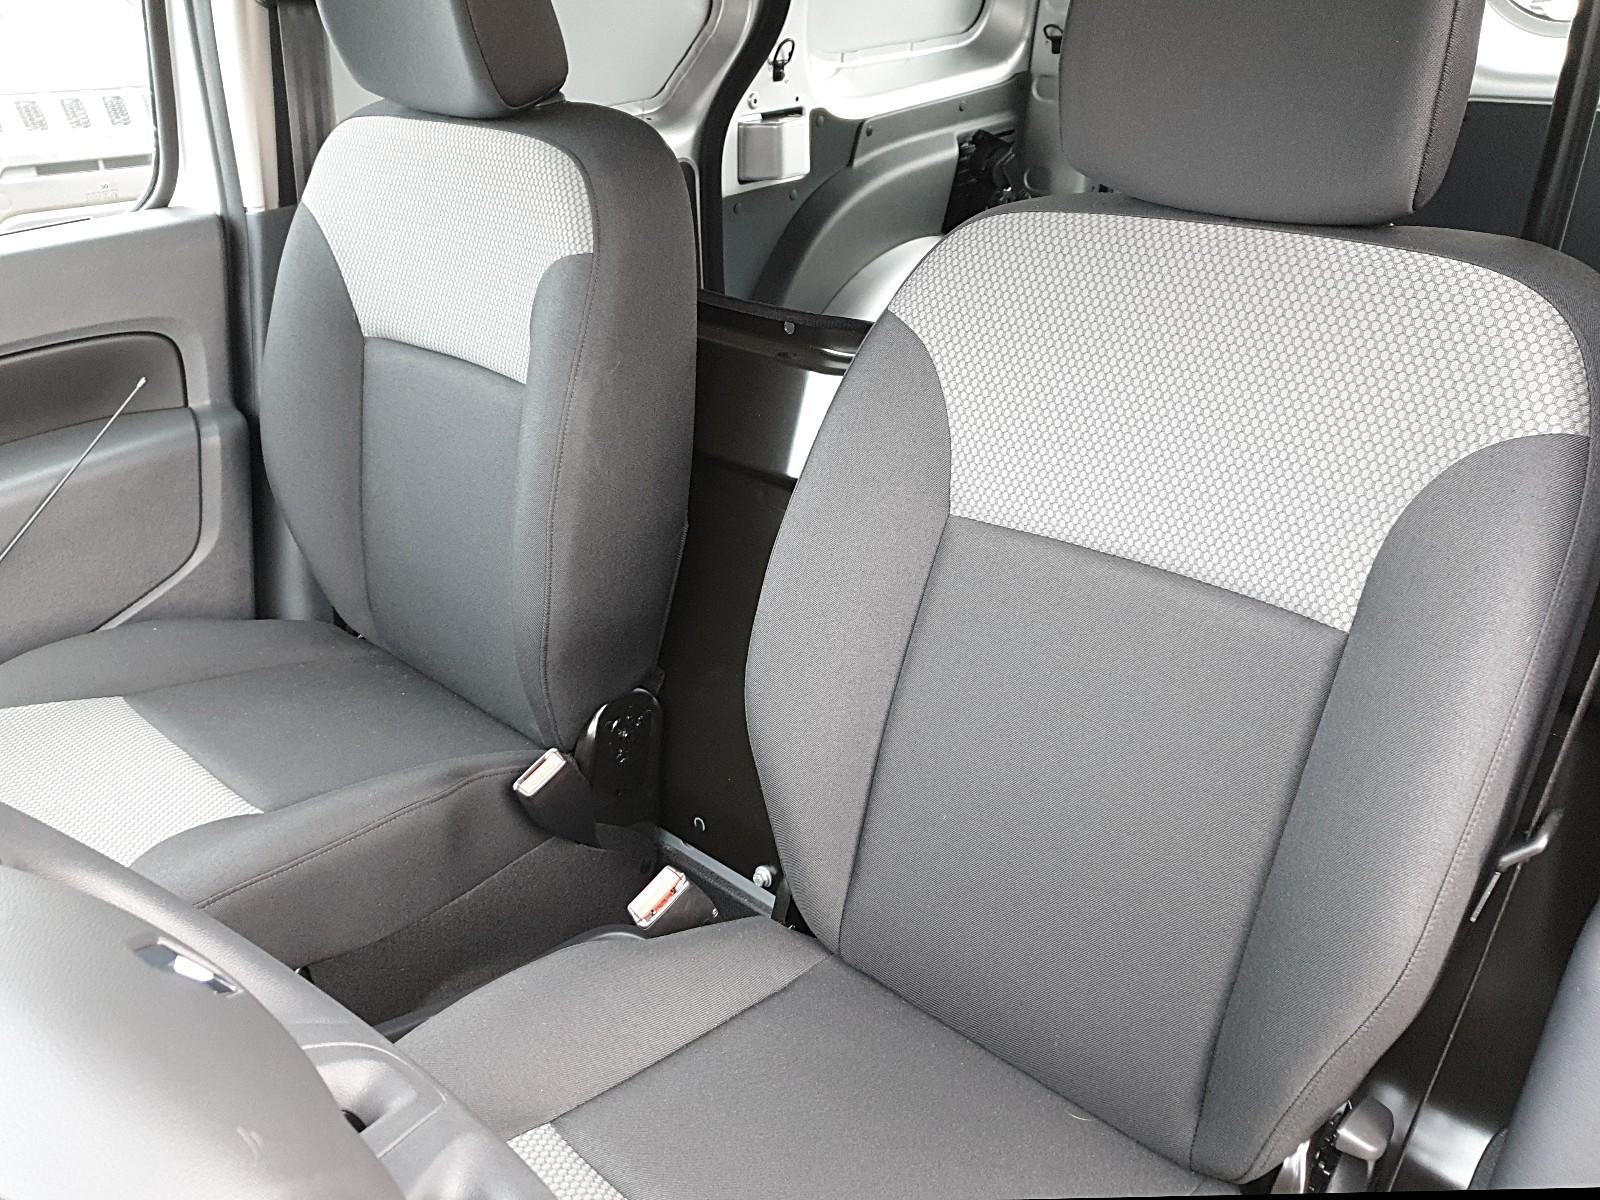 RENAULT KANGOO Rapid 1.5 dCi 90PS 2-Sitzer Klima Bluetooth PDC Tempomat Flügelt Viscaal Fahrzeuggrosshandel GmbH, D-49847 Itterbeck